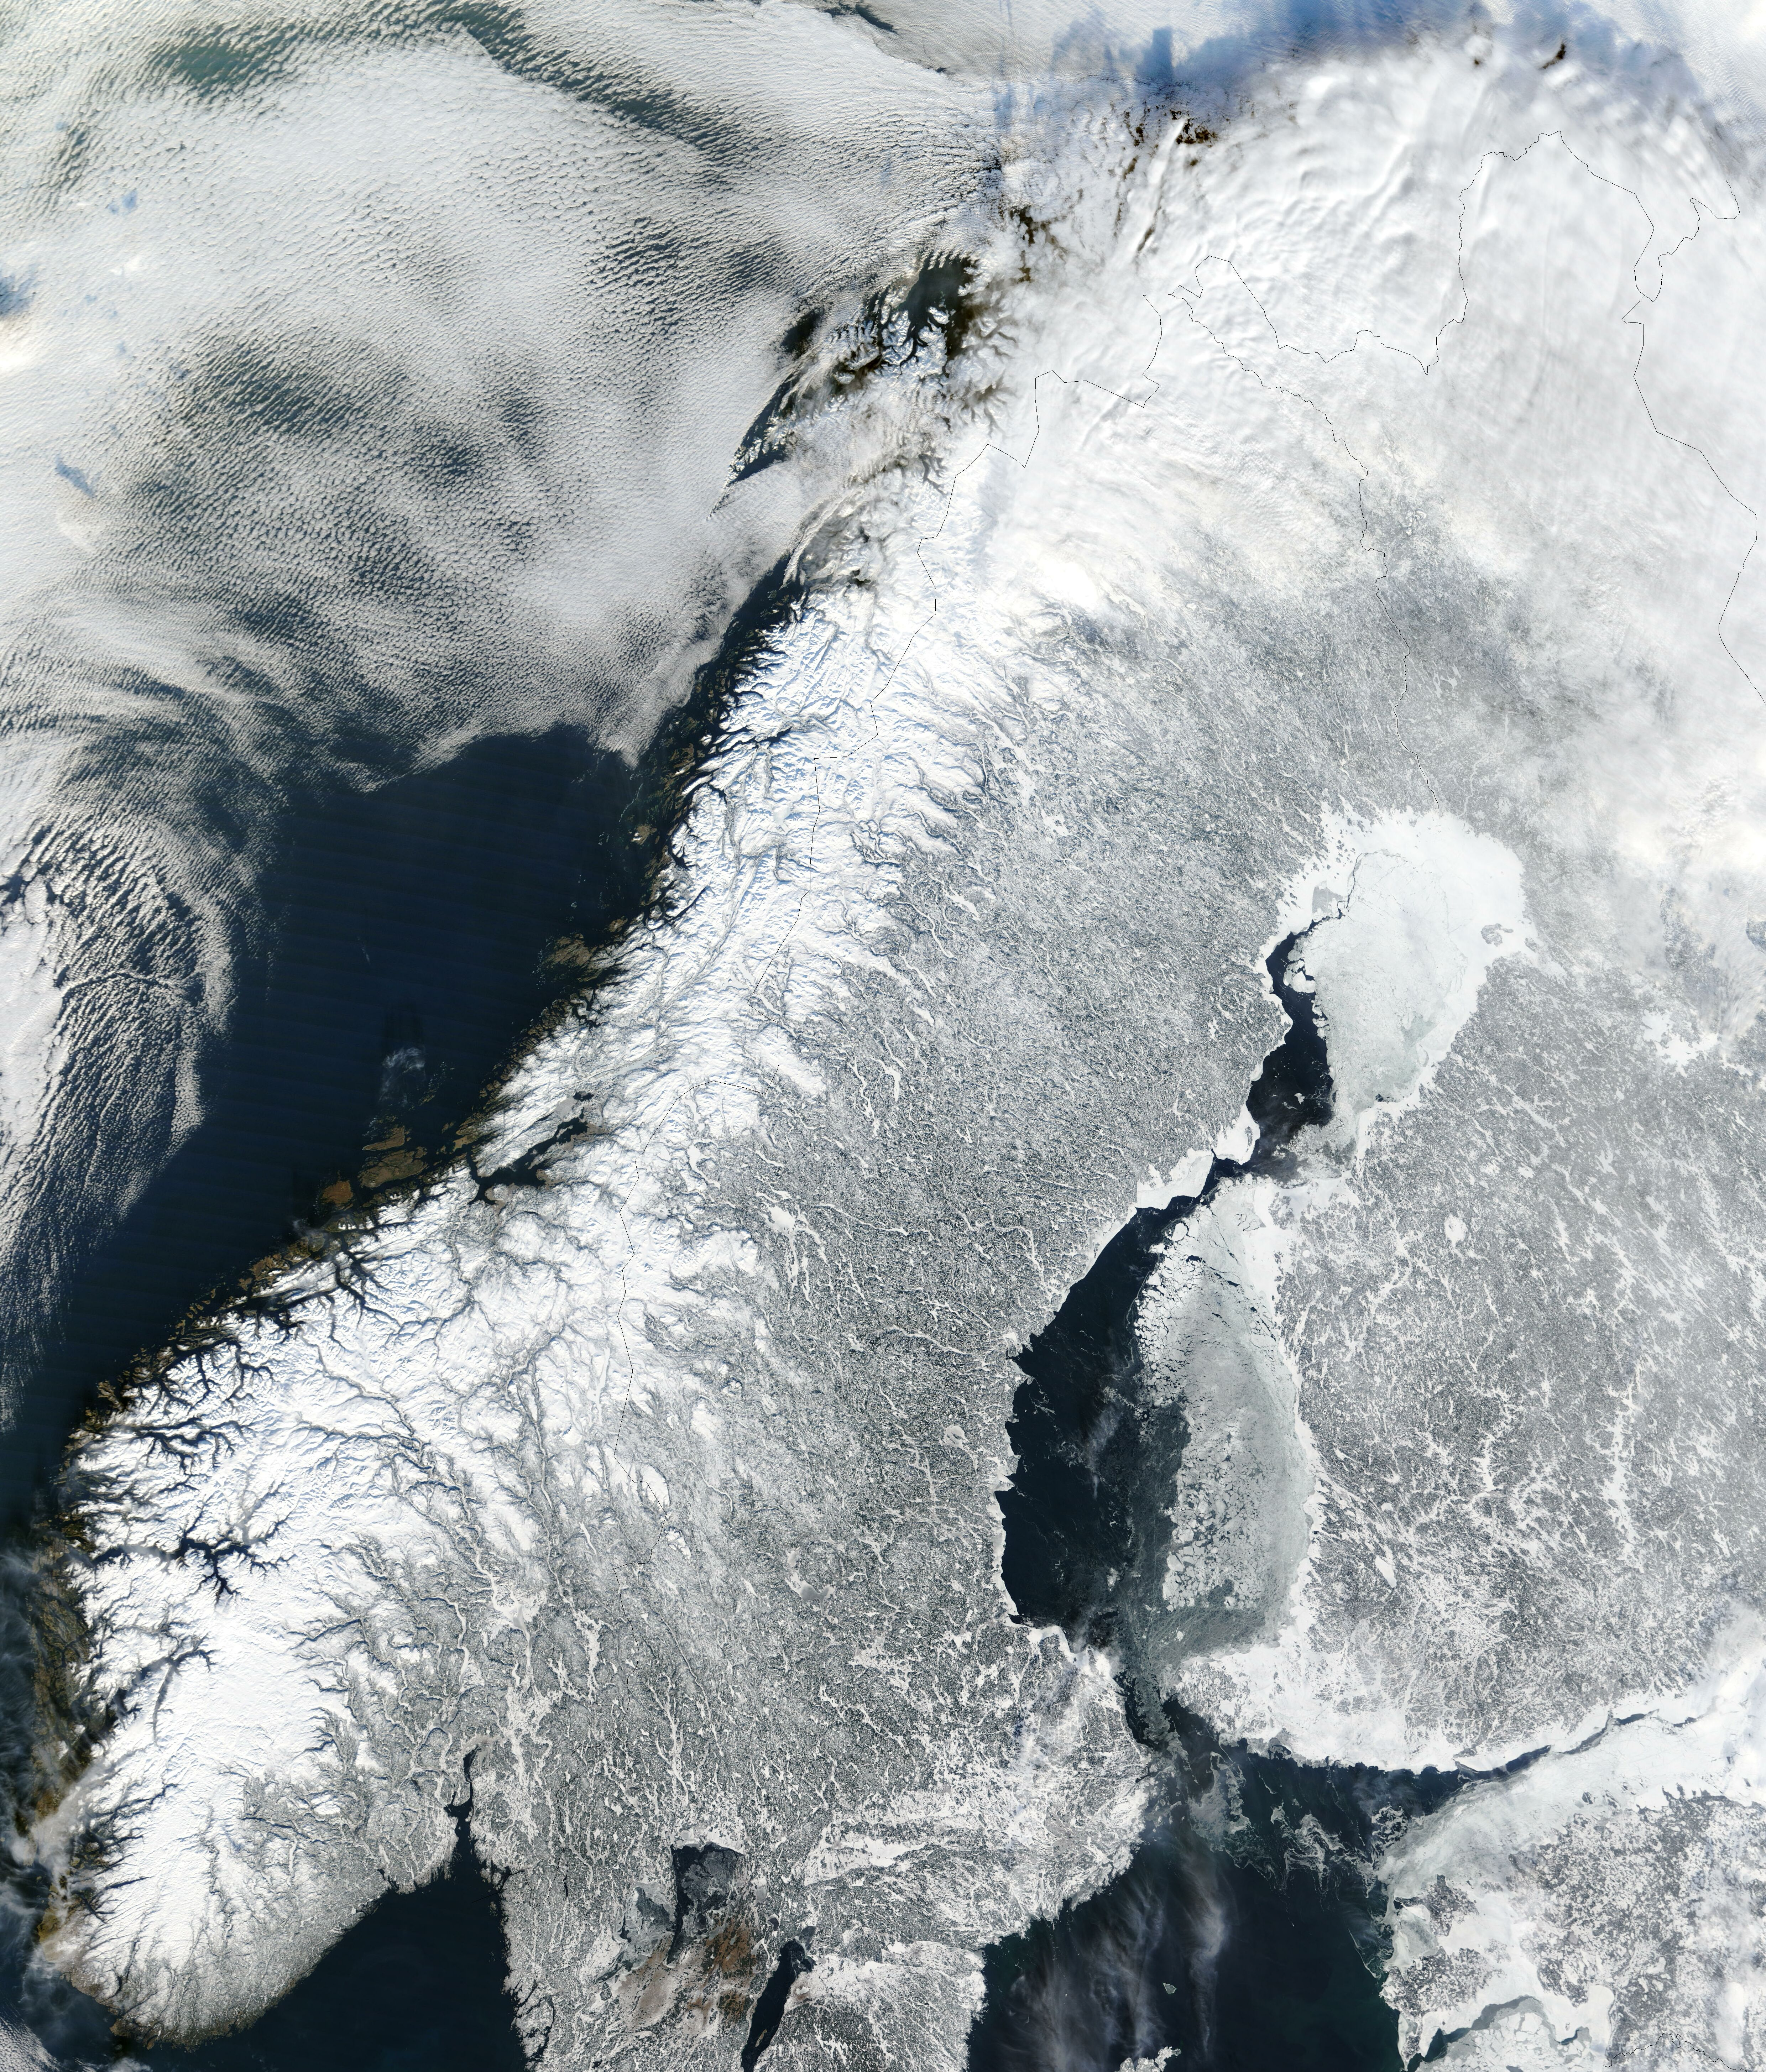 Atlas Of Norway Wikimedia Commons - Norway glacier map